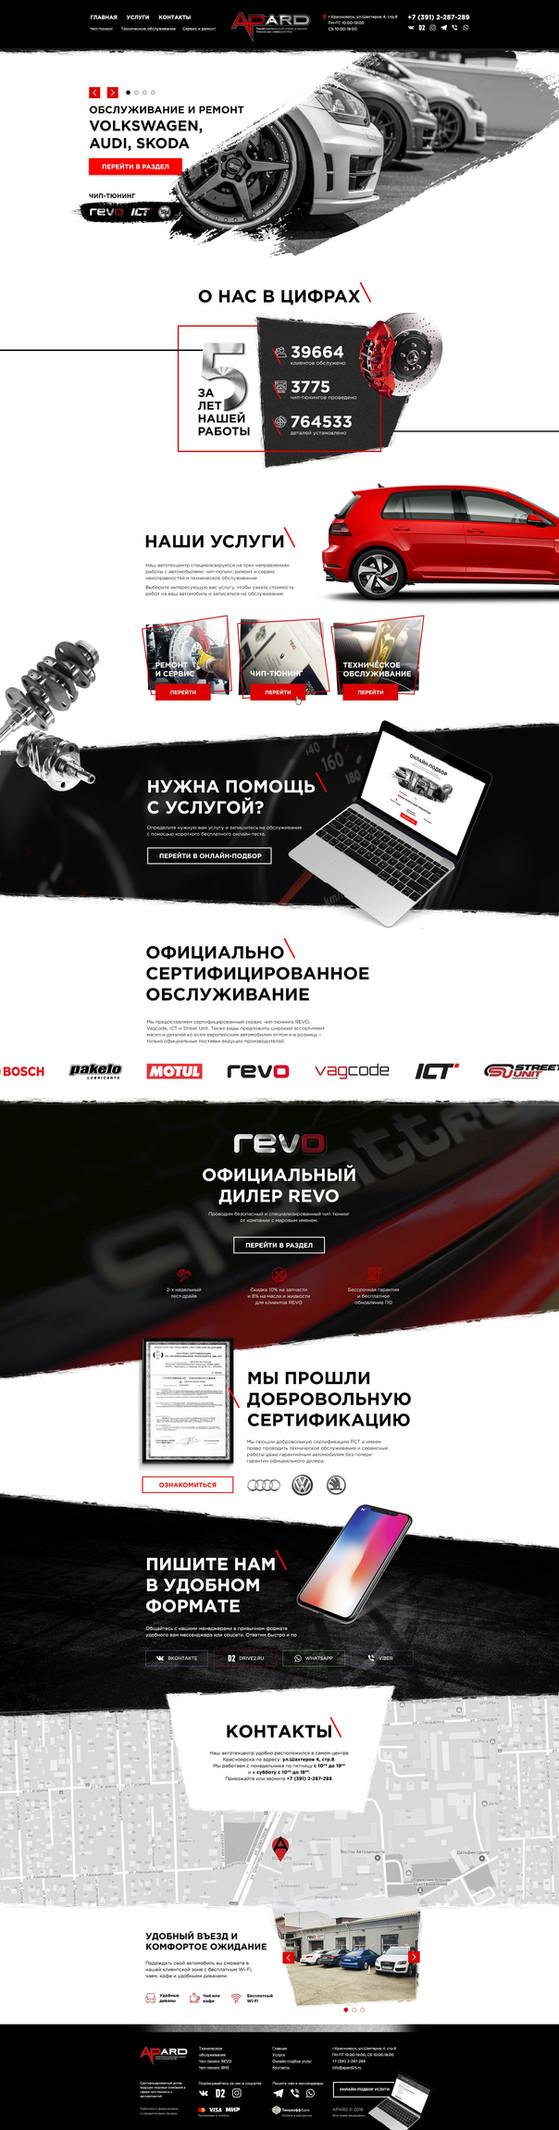 Дизайн сайта Apard